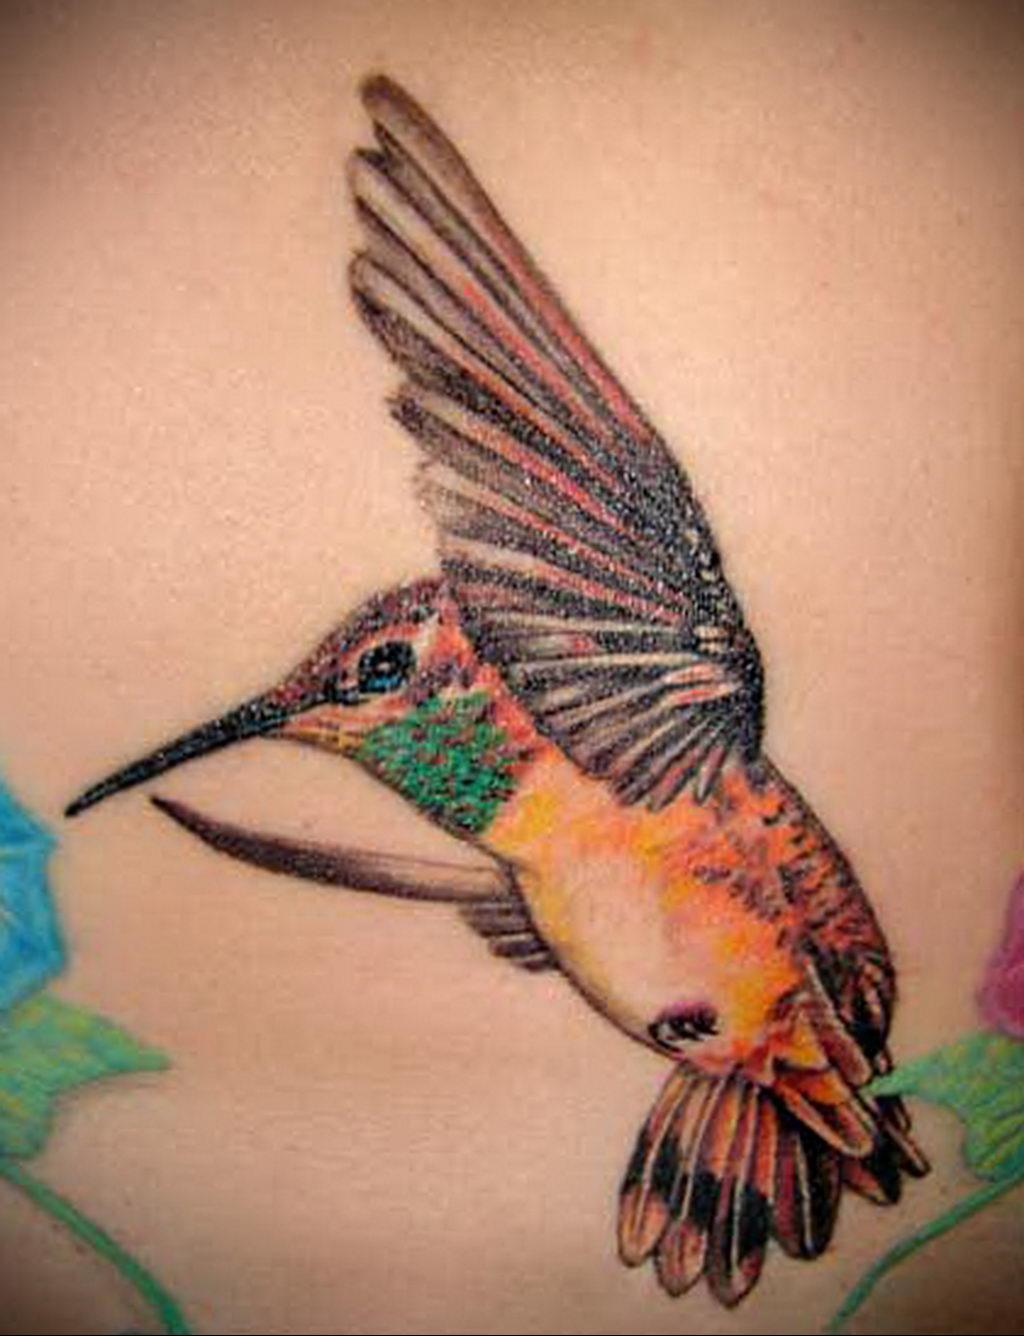 Фото тату про любовь рисунок Птица 03.02.2020 №302 -bird tattoo- tatufoto.com